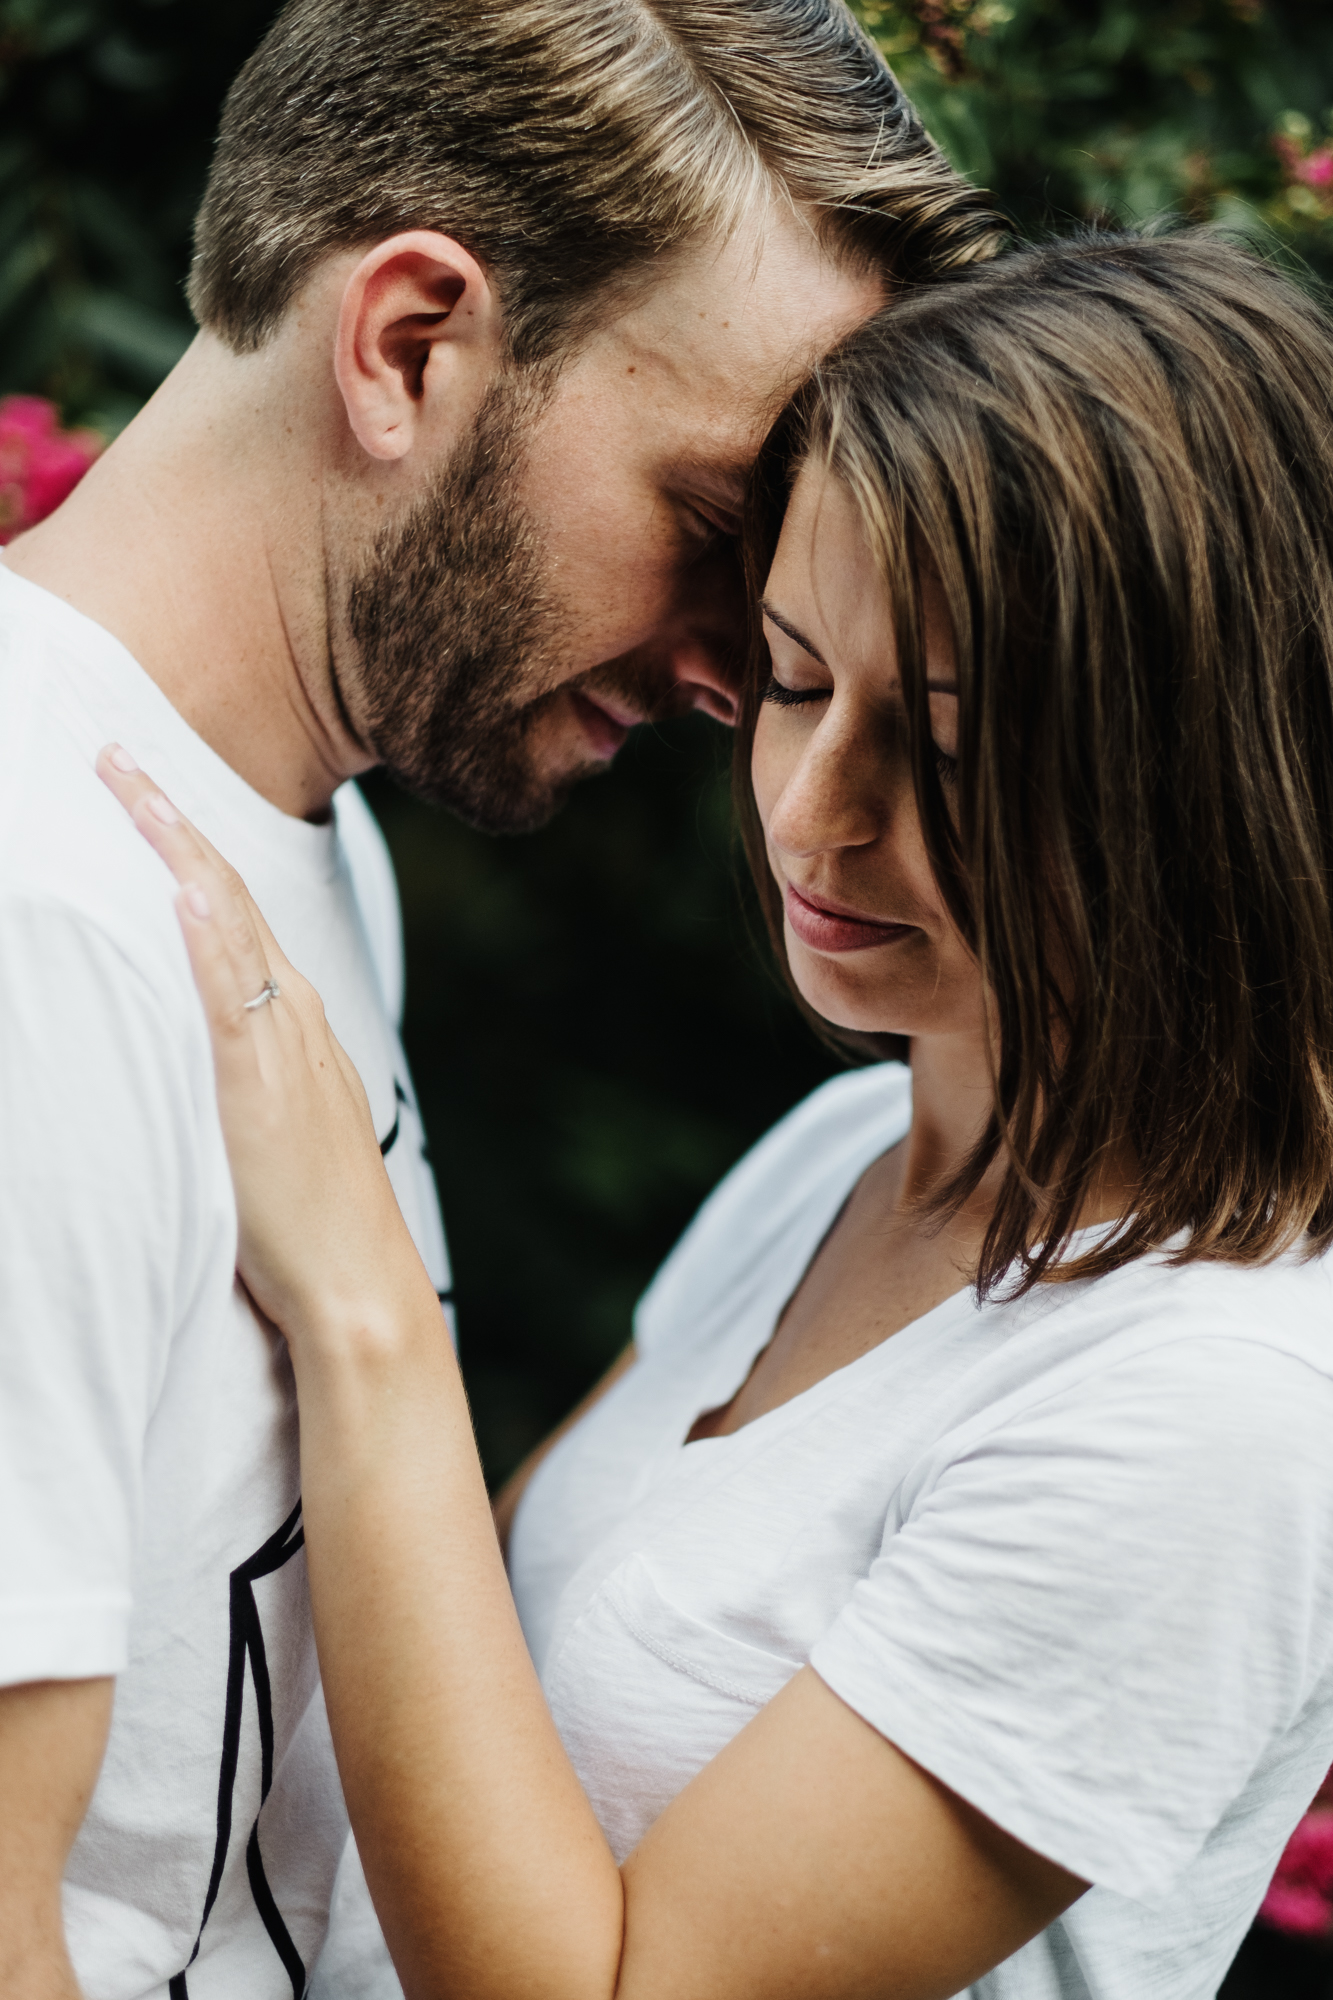 Wedding_Francis_Boucher_Photography_Brooklyn_engagement_2018-24.jpg